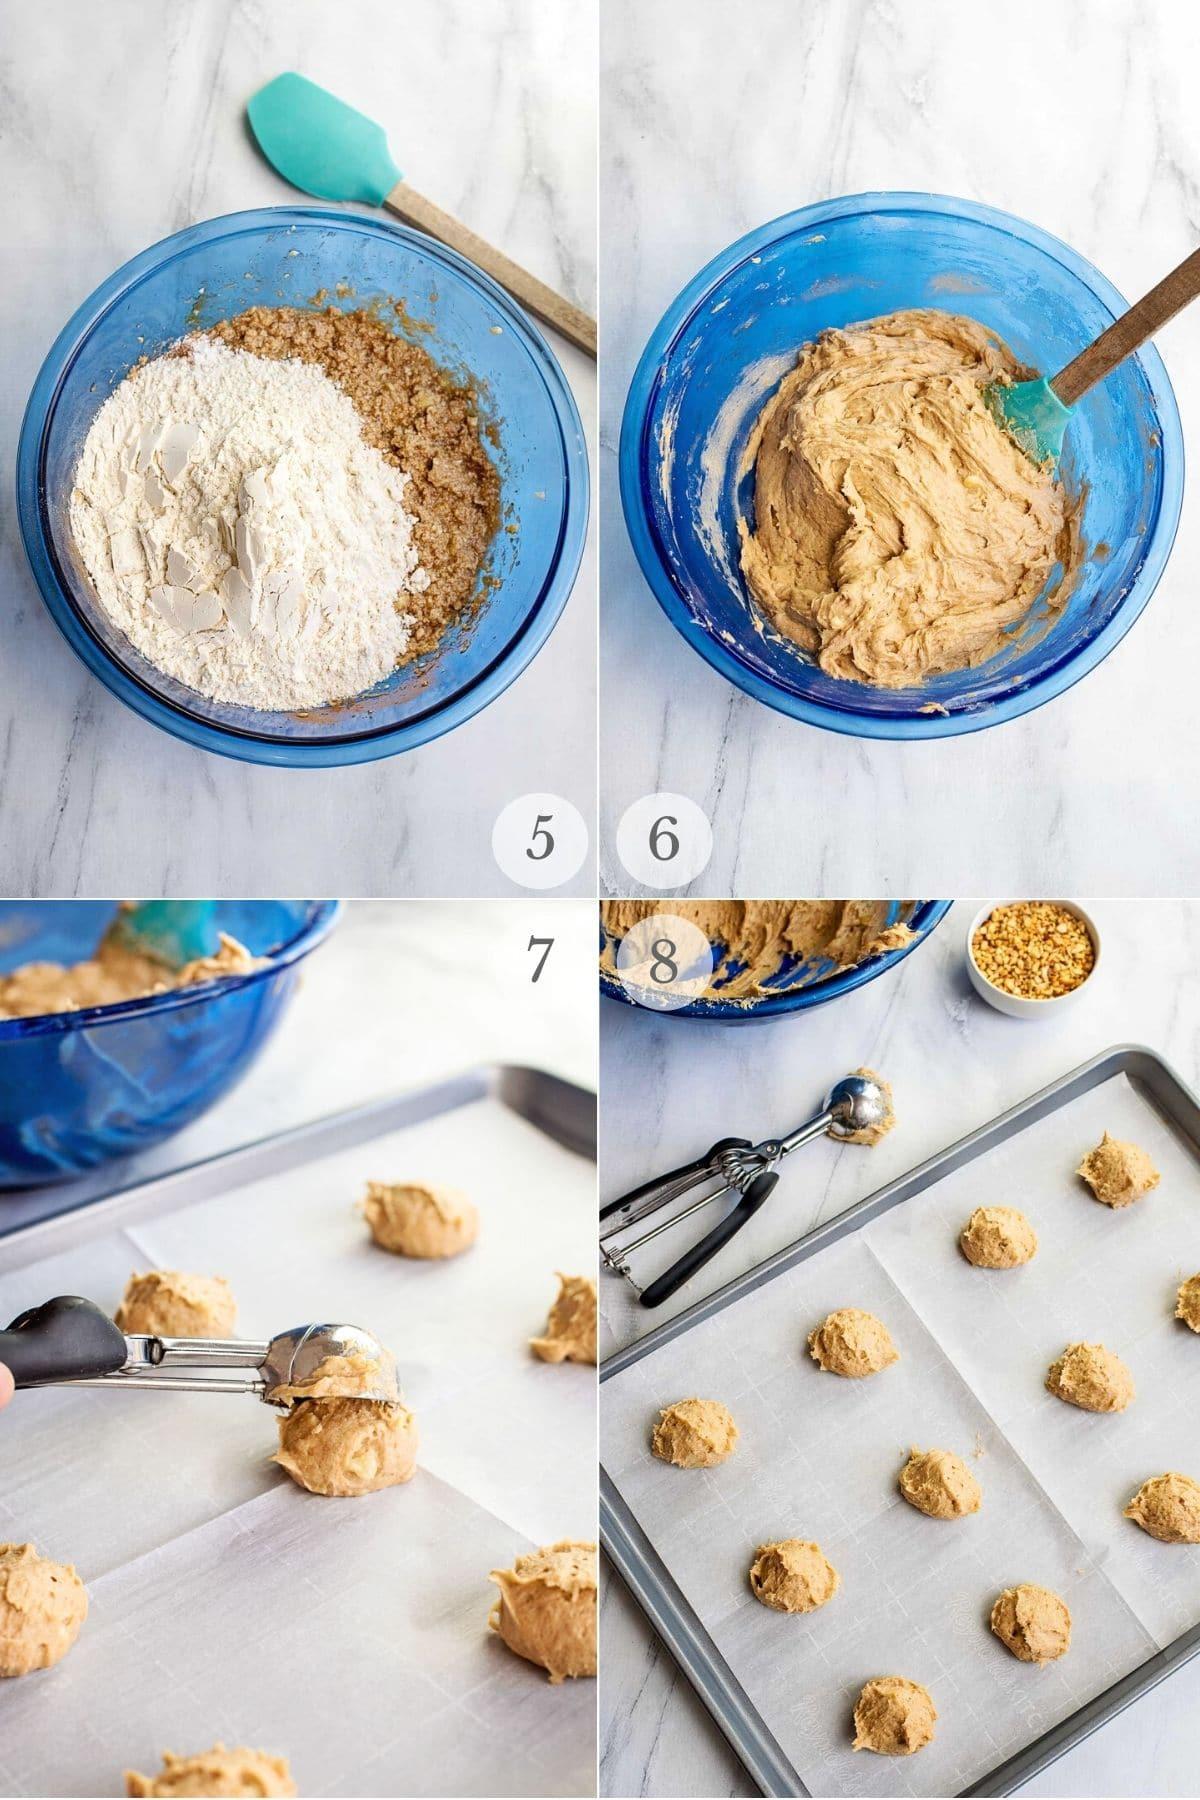 Banana Bread Cookies recipes steps 5-8